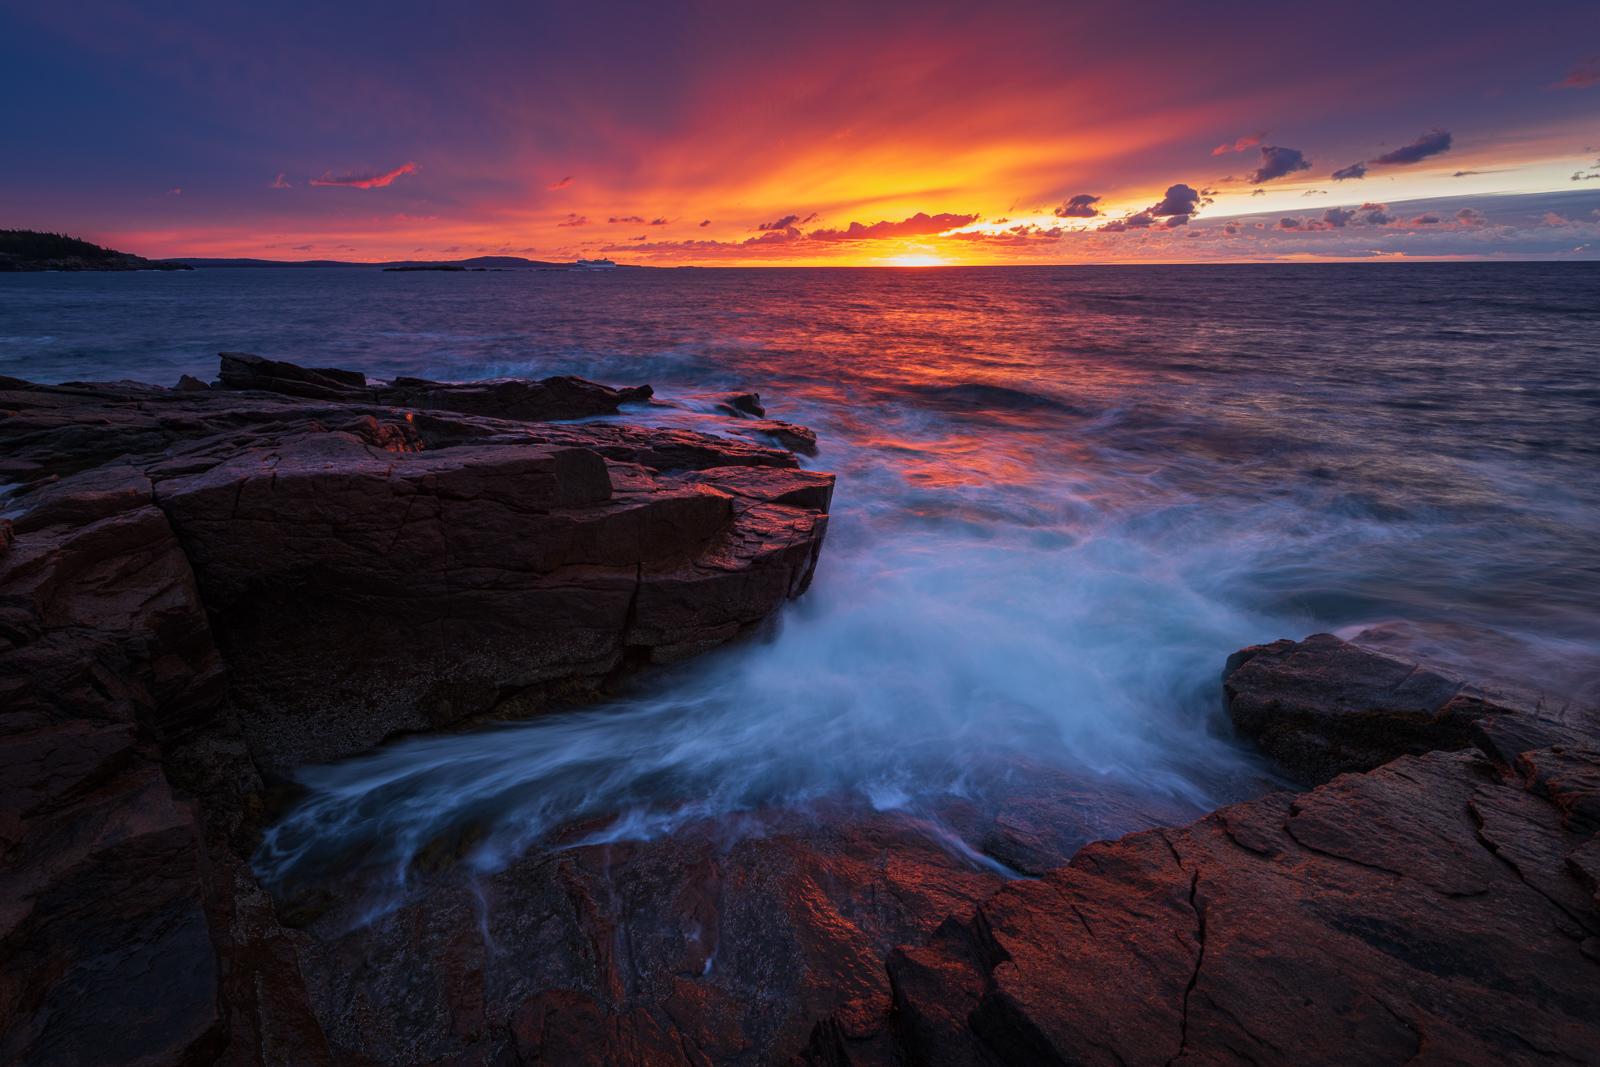 A stunning autumn sunrise from Acadia National Park's rugged coast.